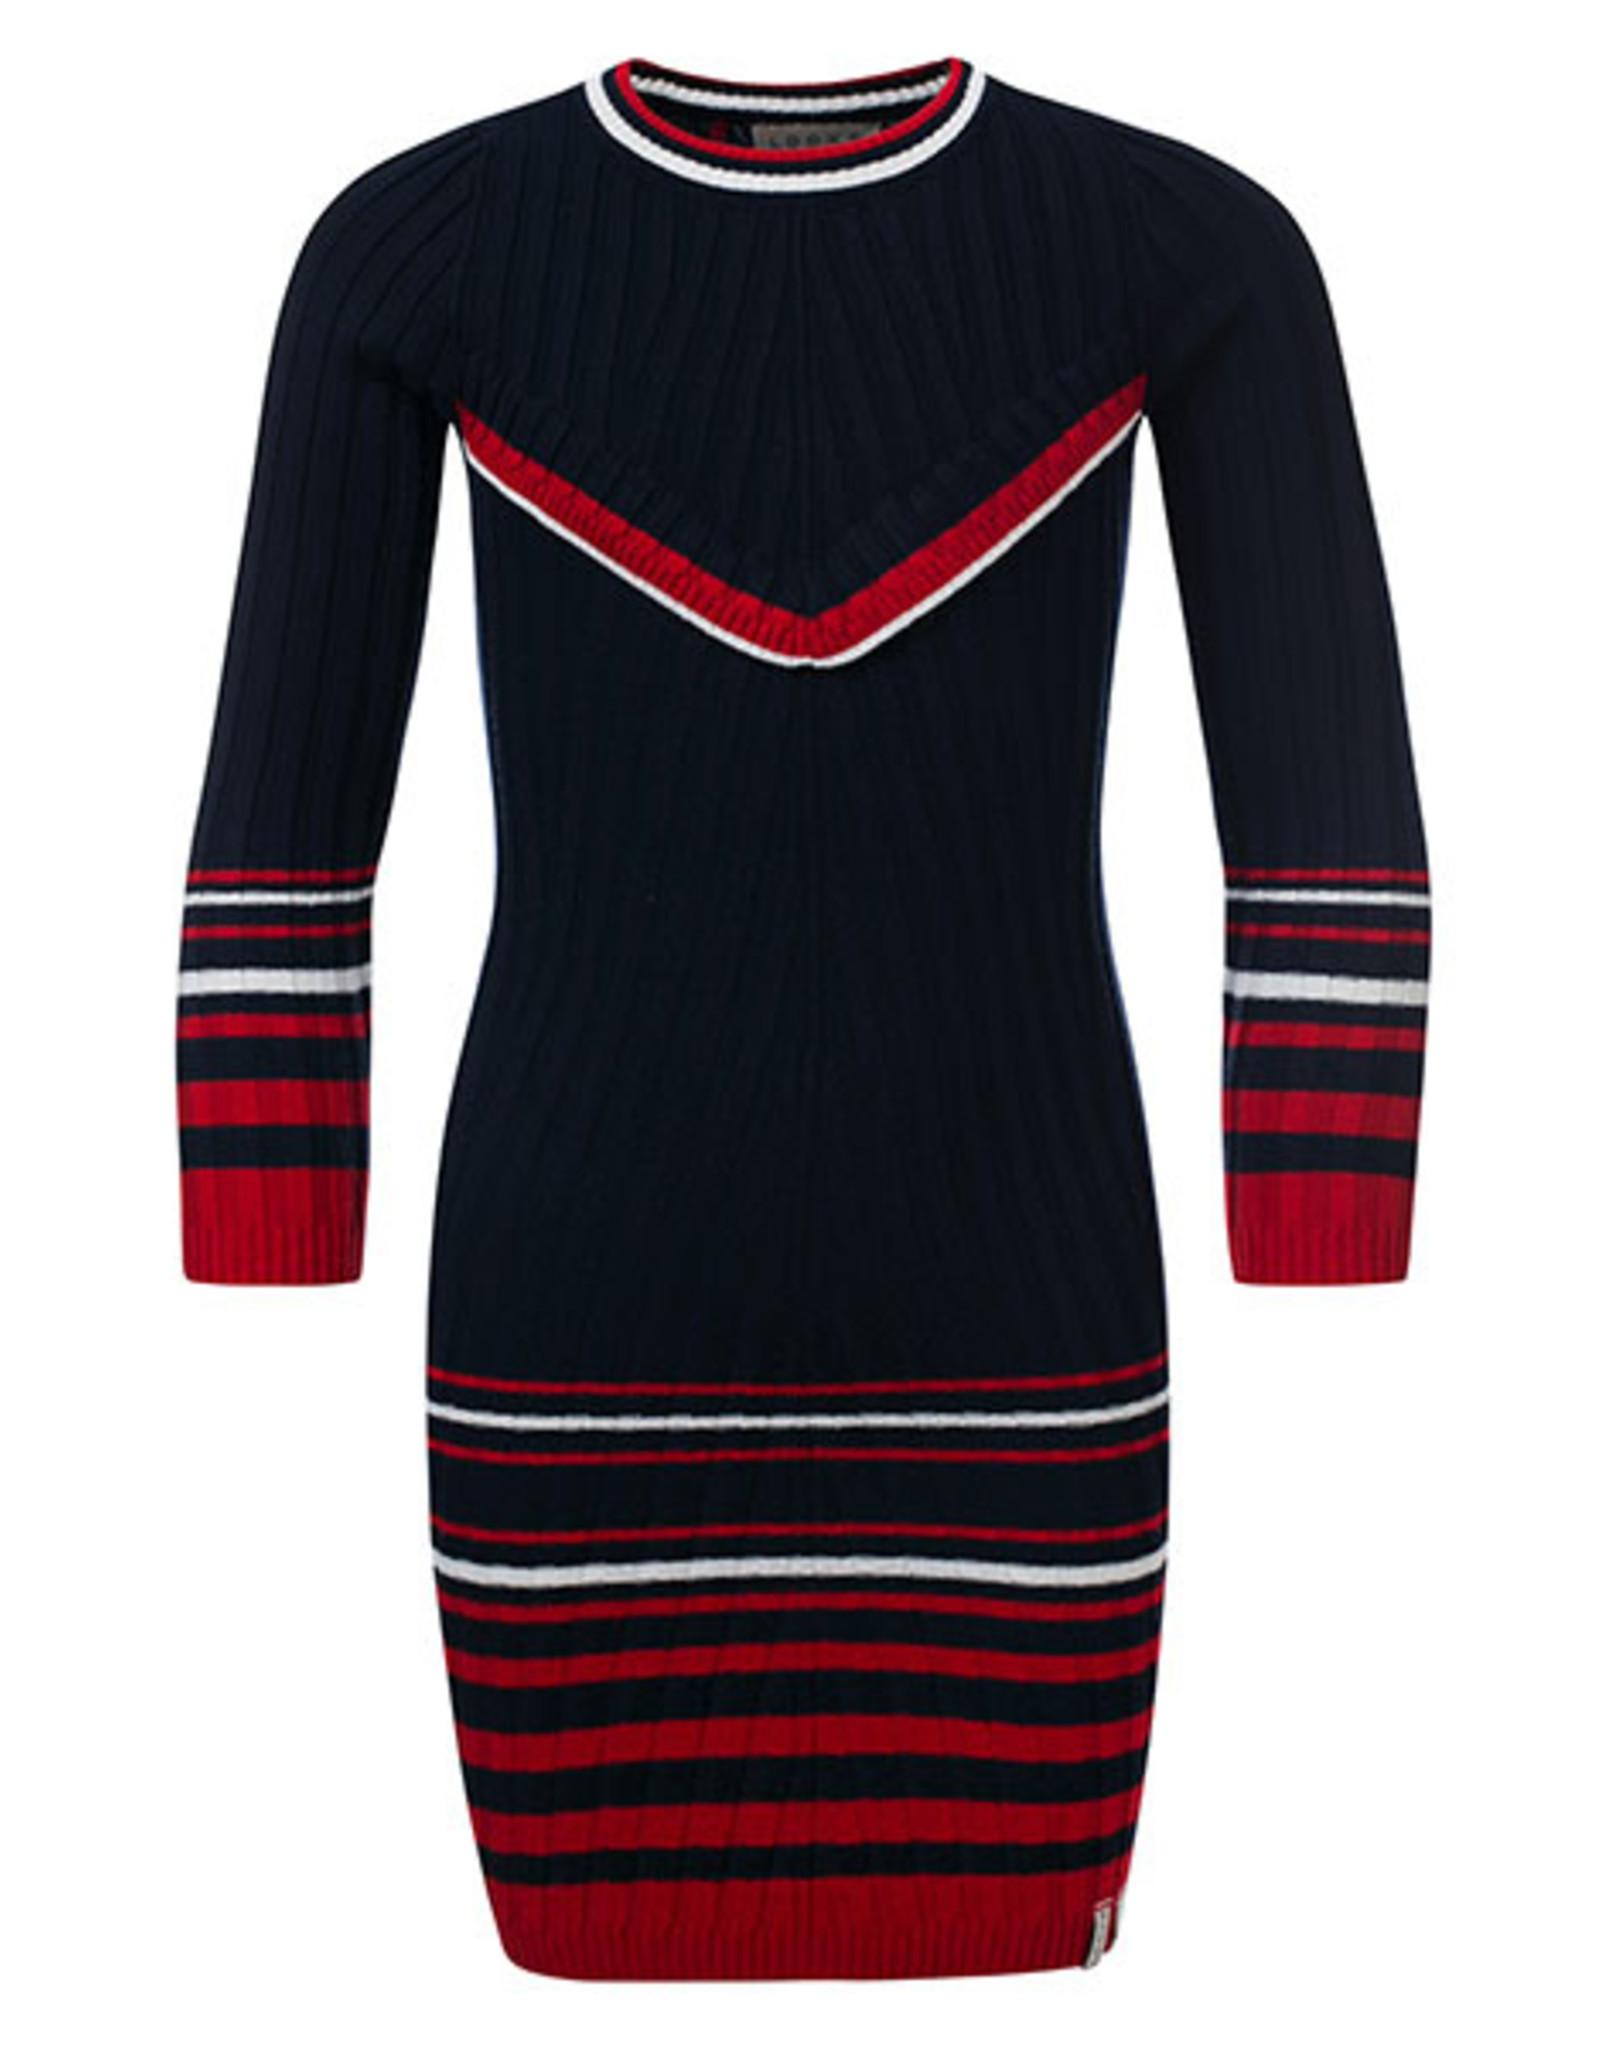 Looxs Revolution Girls knitted rib dress